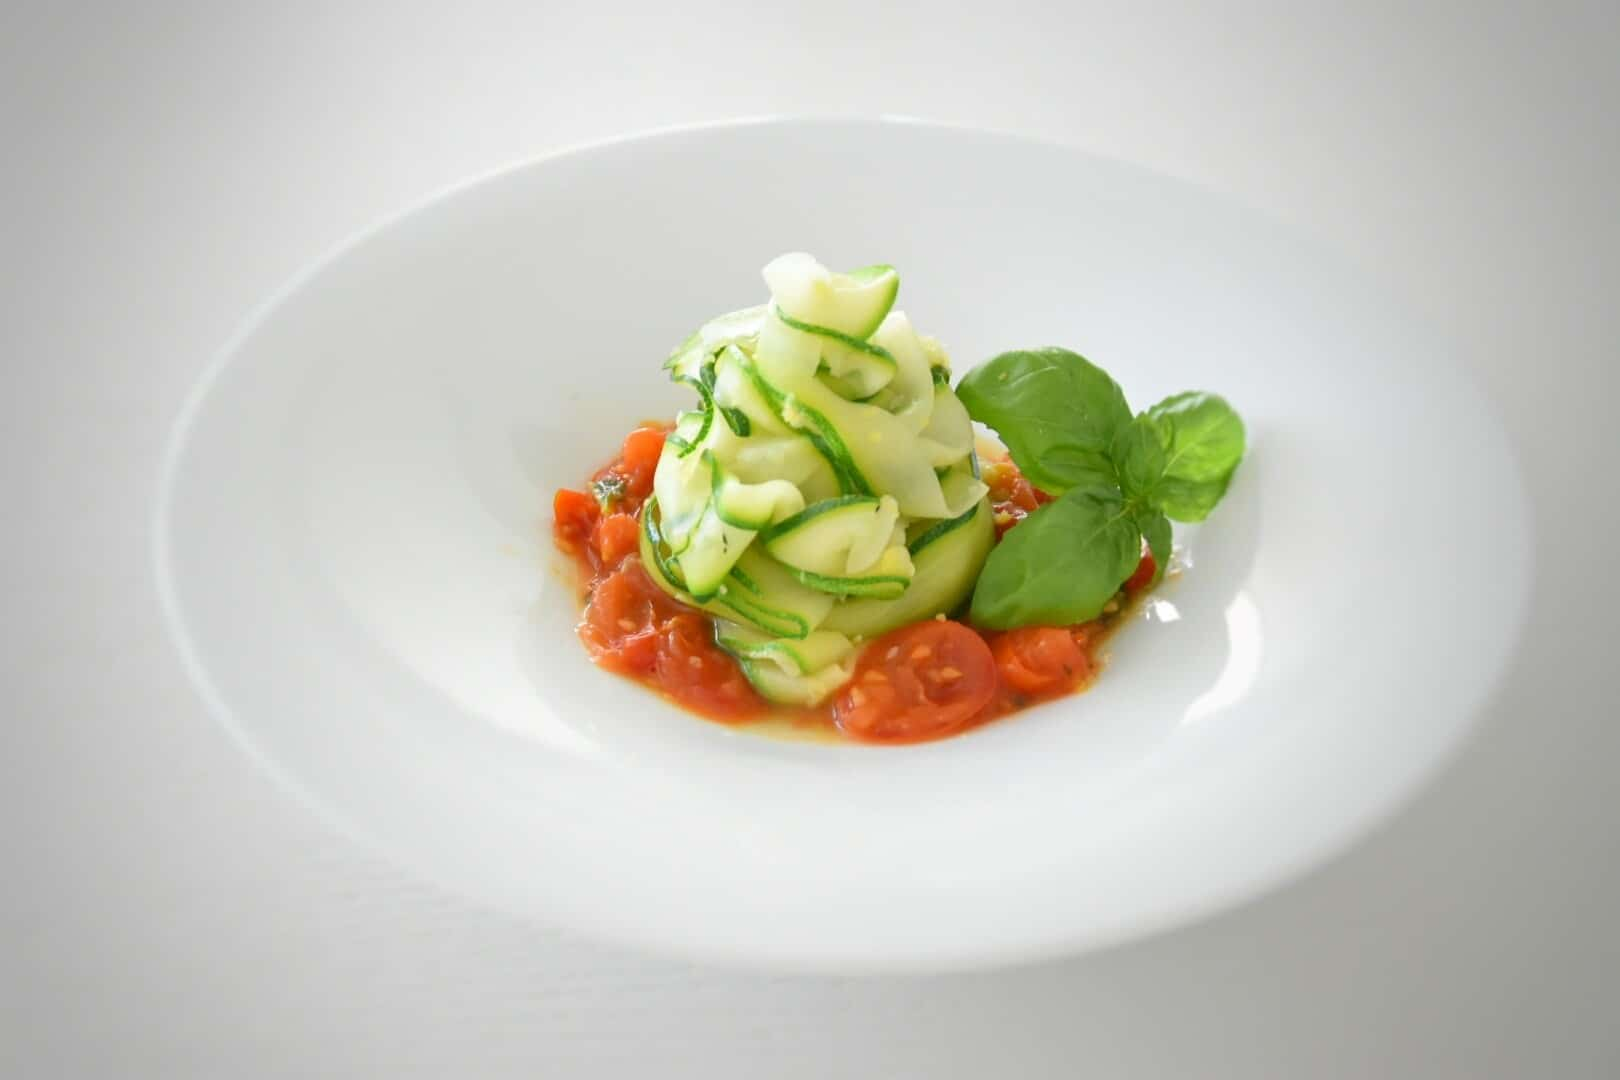 Pappardelle vegane: zucchina, zenzero, pomodorini e zest